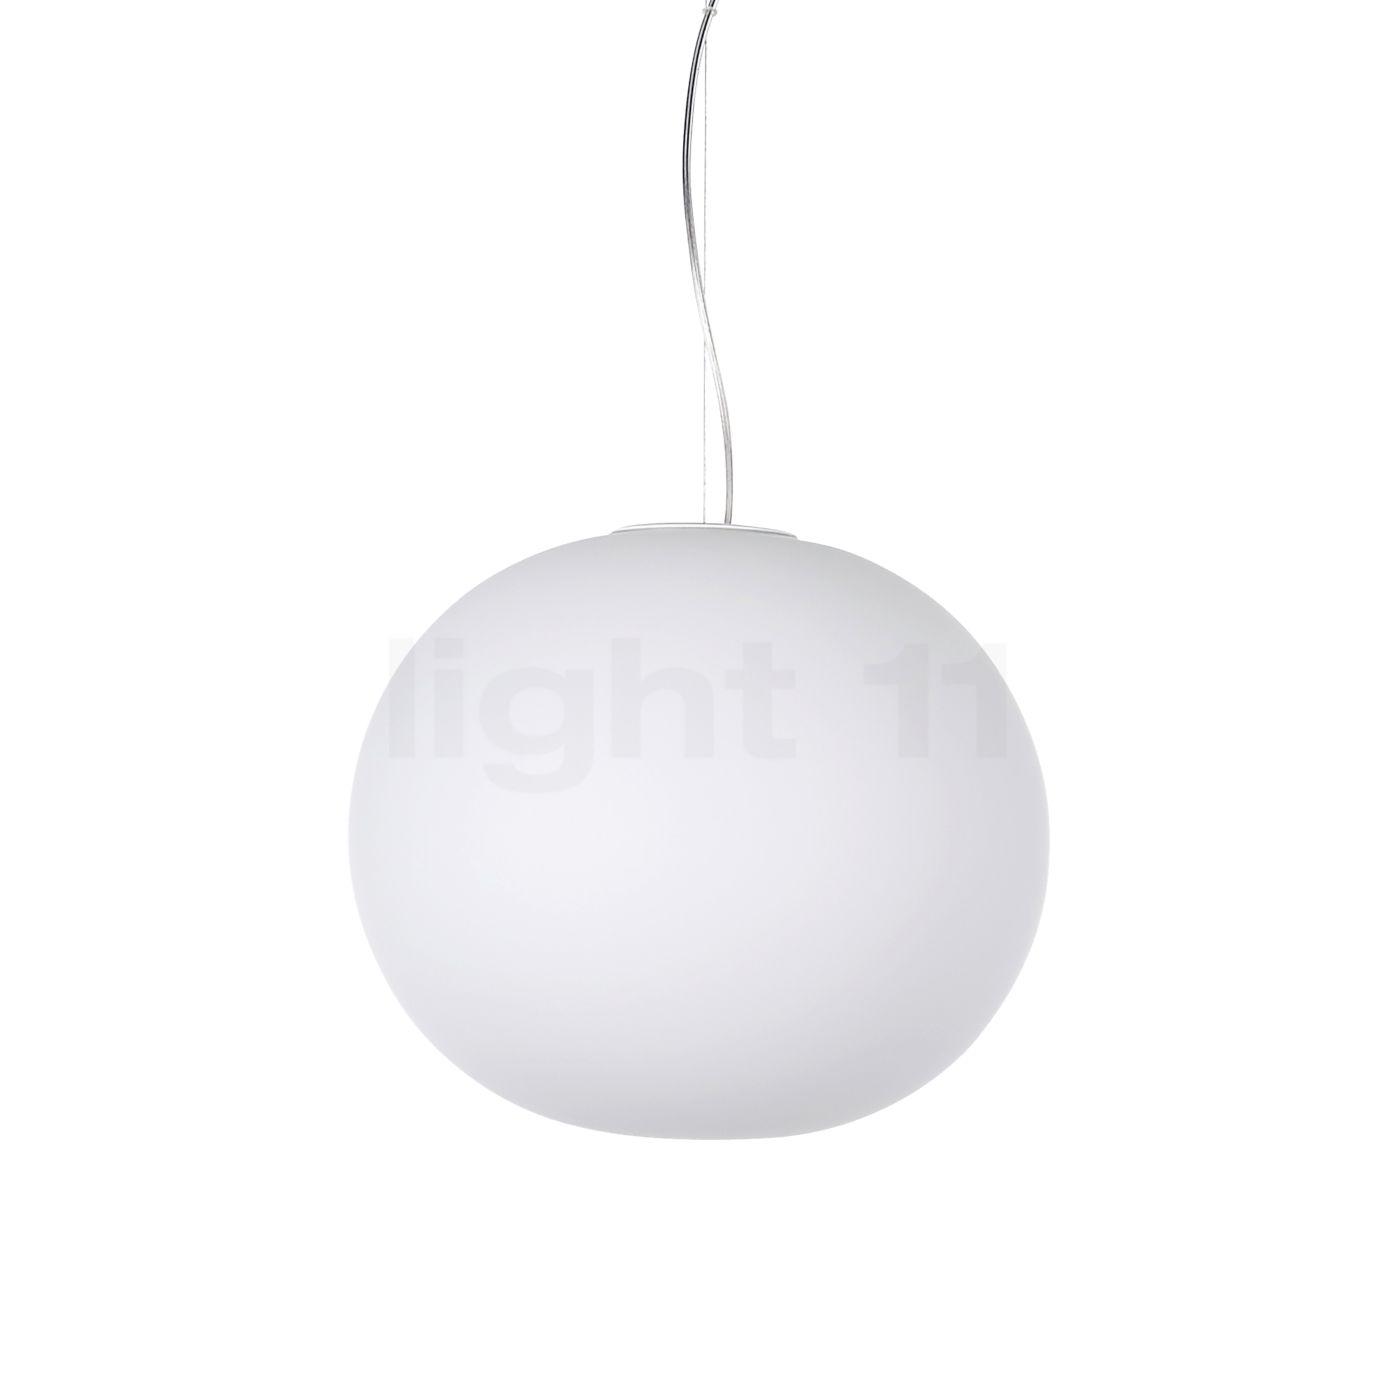 Flos-Glo-Ball-S1--2000087200001_1_p Elegantes Flos Glo Ball S Dekorationen